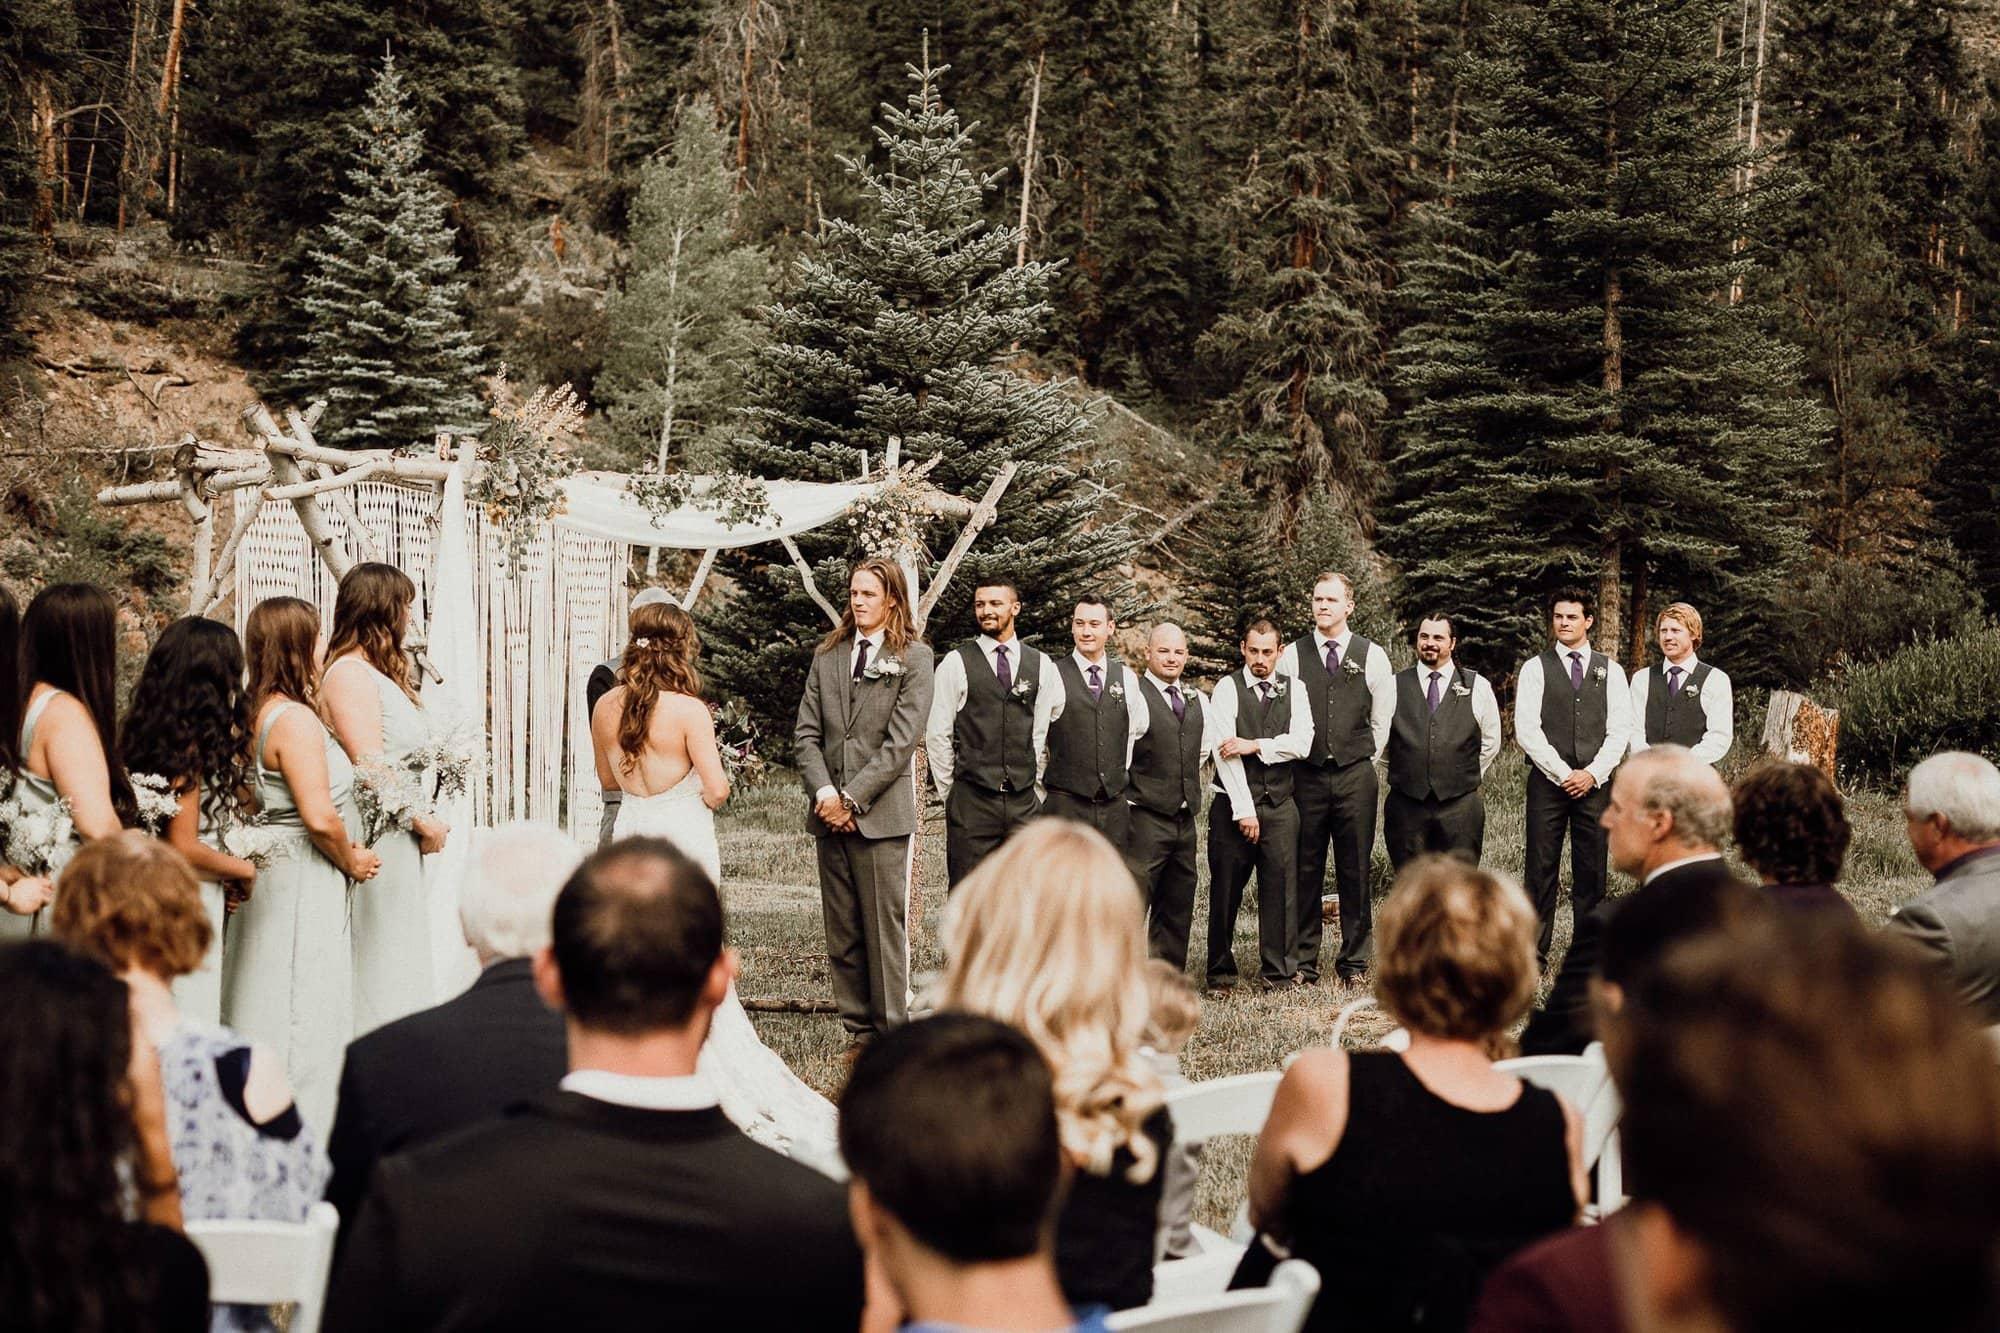 ASPEN CANYON WEDDING IASPEN CANYONWEDDING PHOTOS |JEN + JEREMY |JUSTYNA E BUTLER PHOTOGRAPHY| COLORADO FALL WEDDING | COLORADO MOUNTAIN WEDDING PHOTOGRAPHY